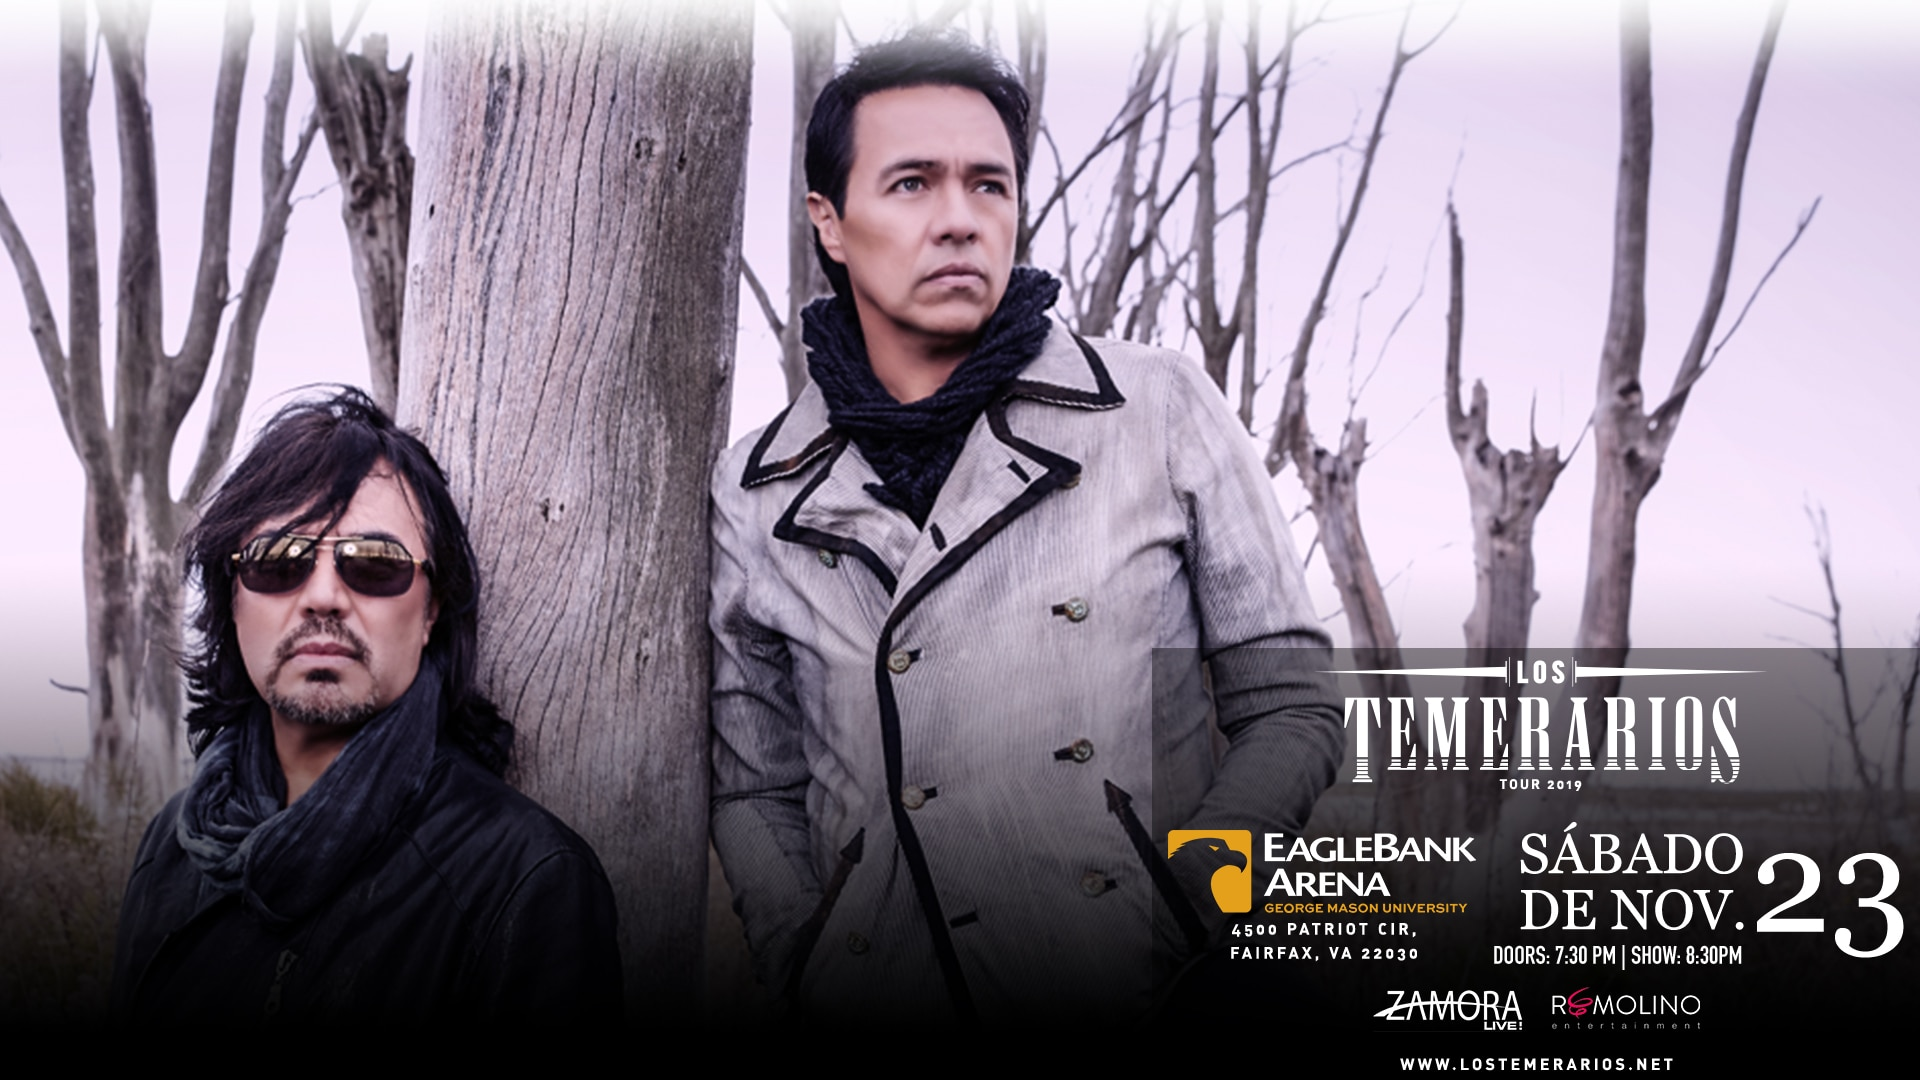 Los Temerarios  2019 Tour